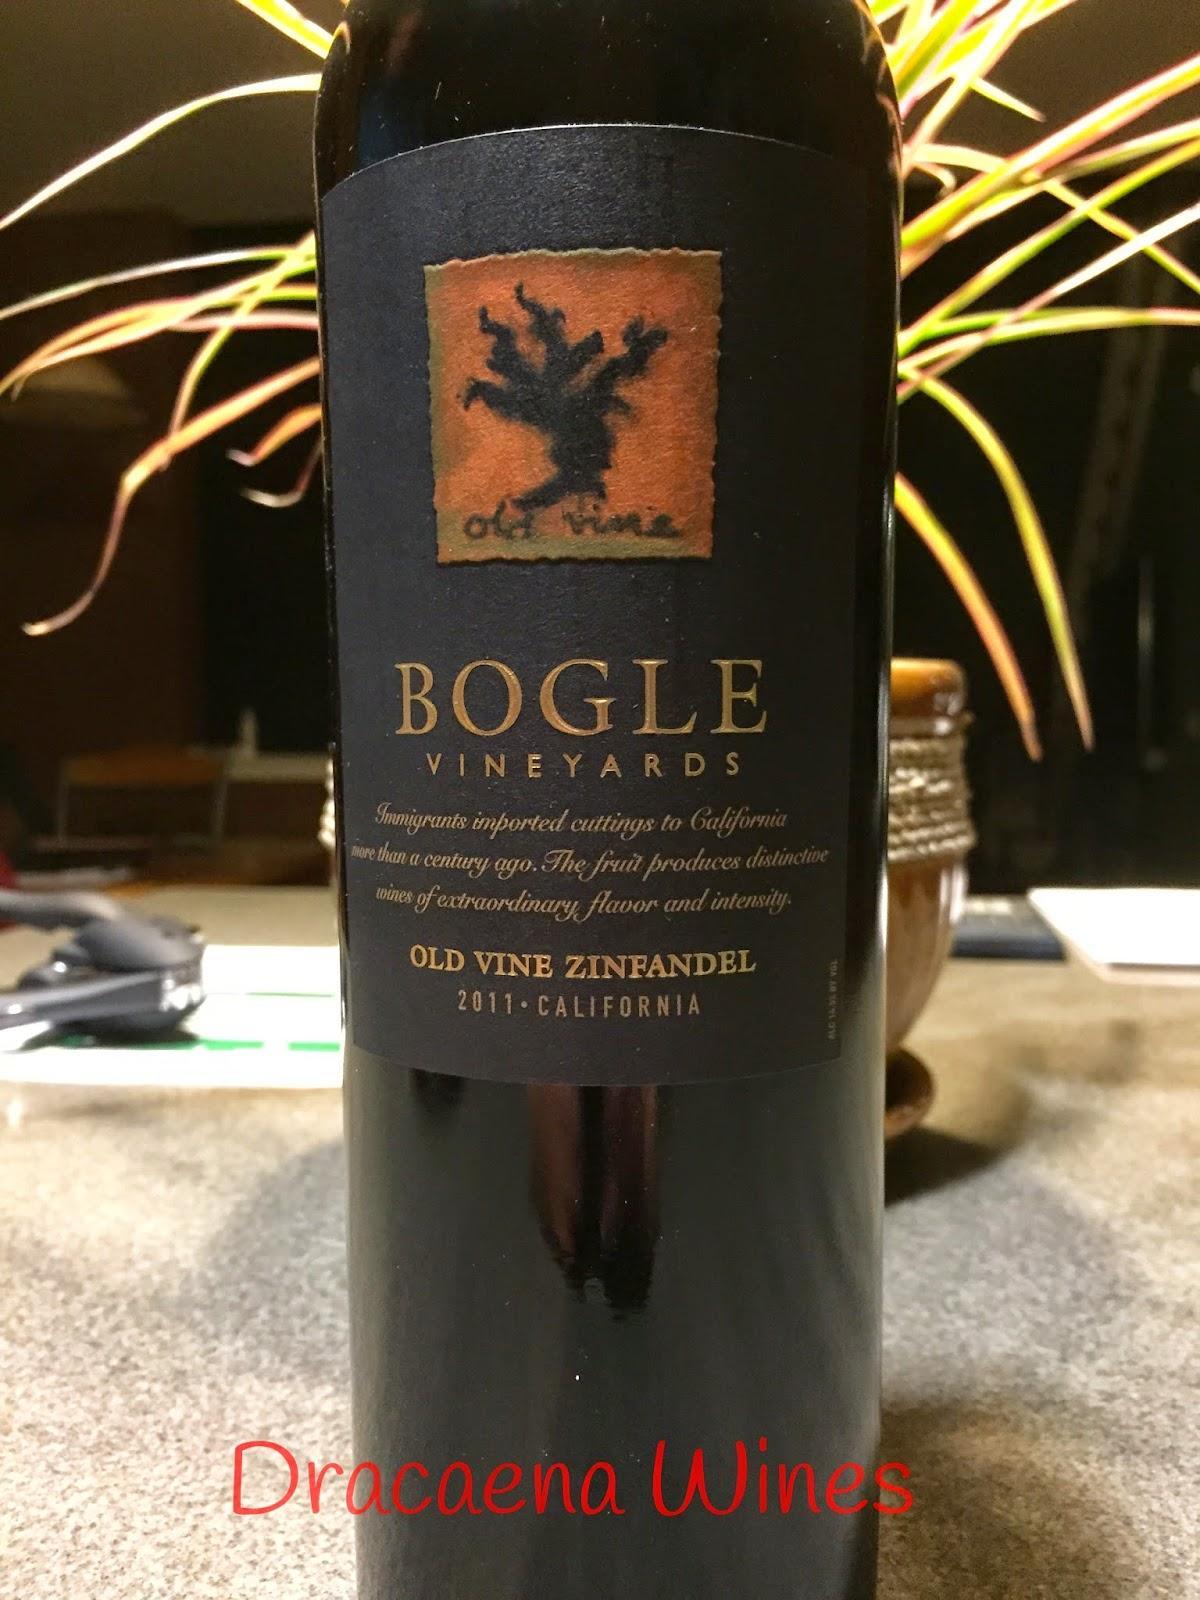 Bogle vineyards, wine lover